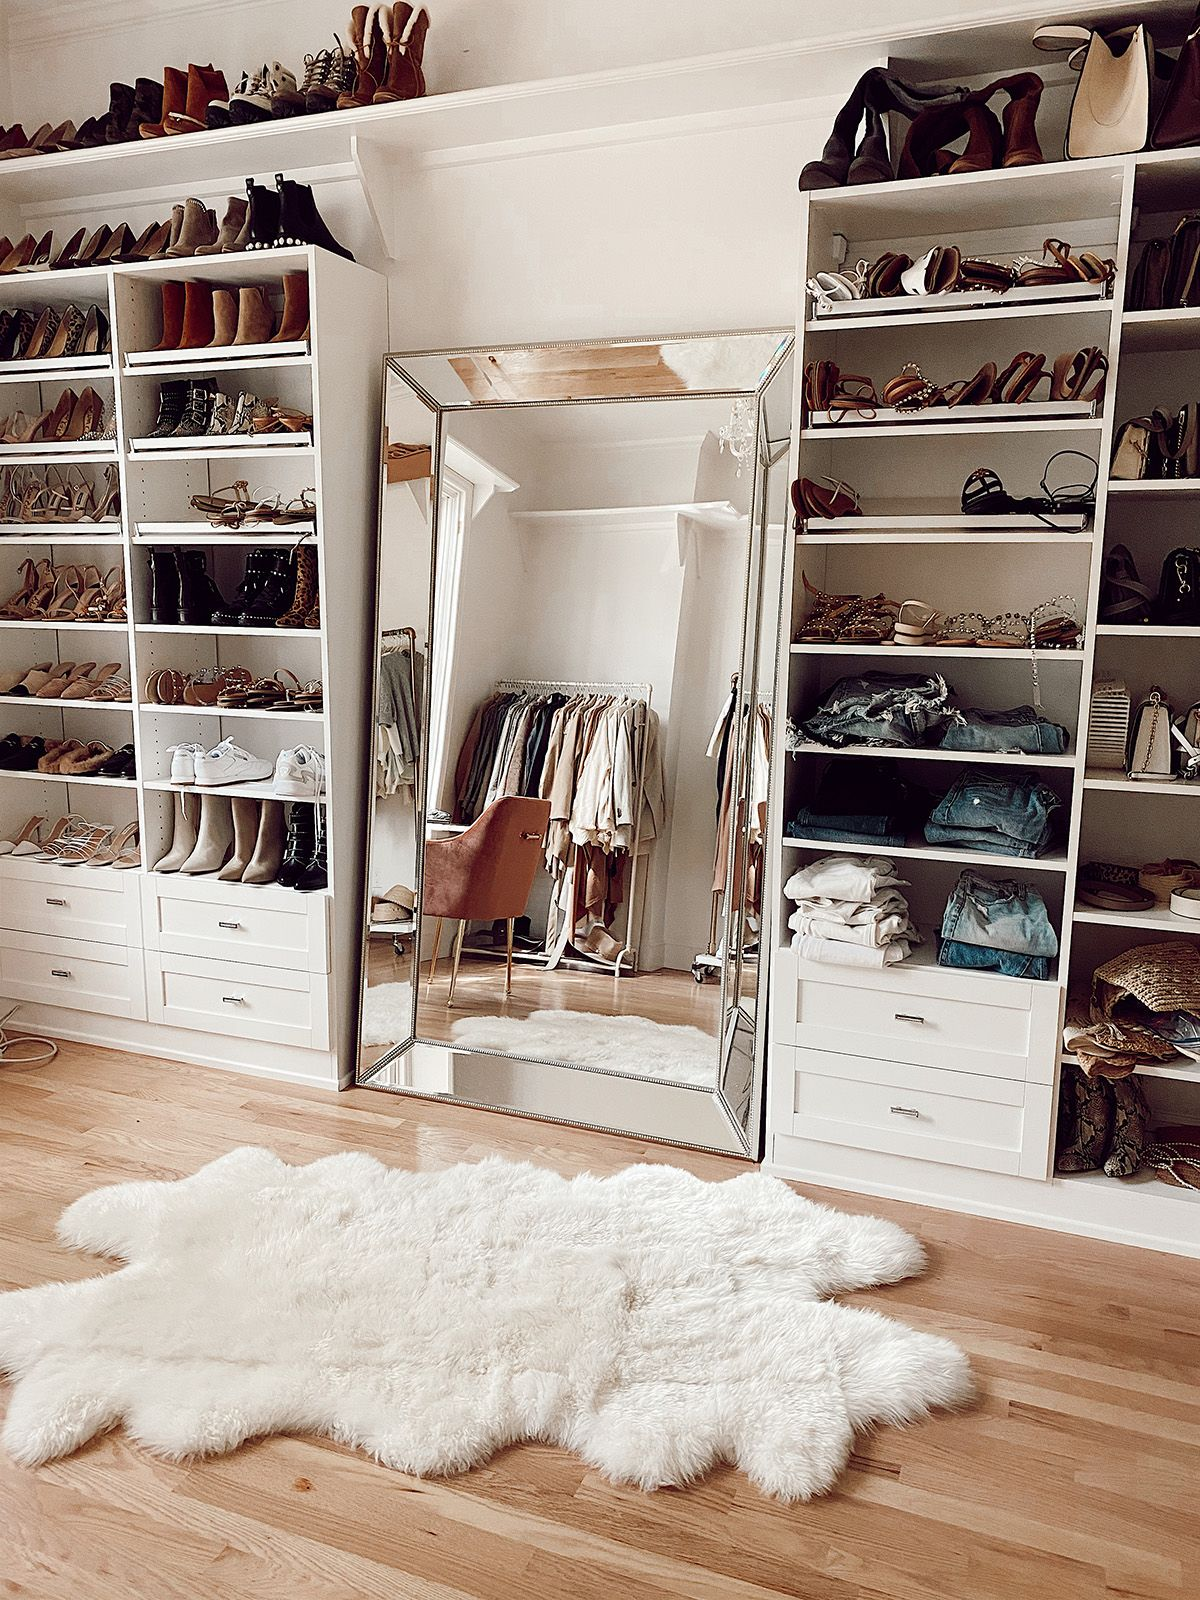 Home Office & Closet Organization